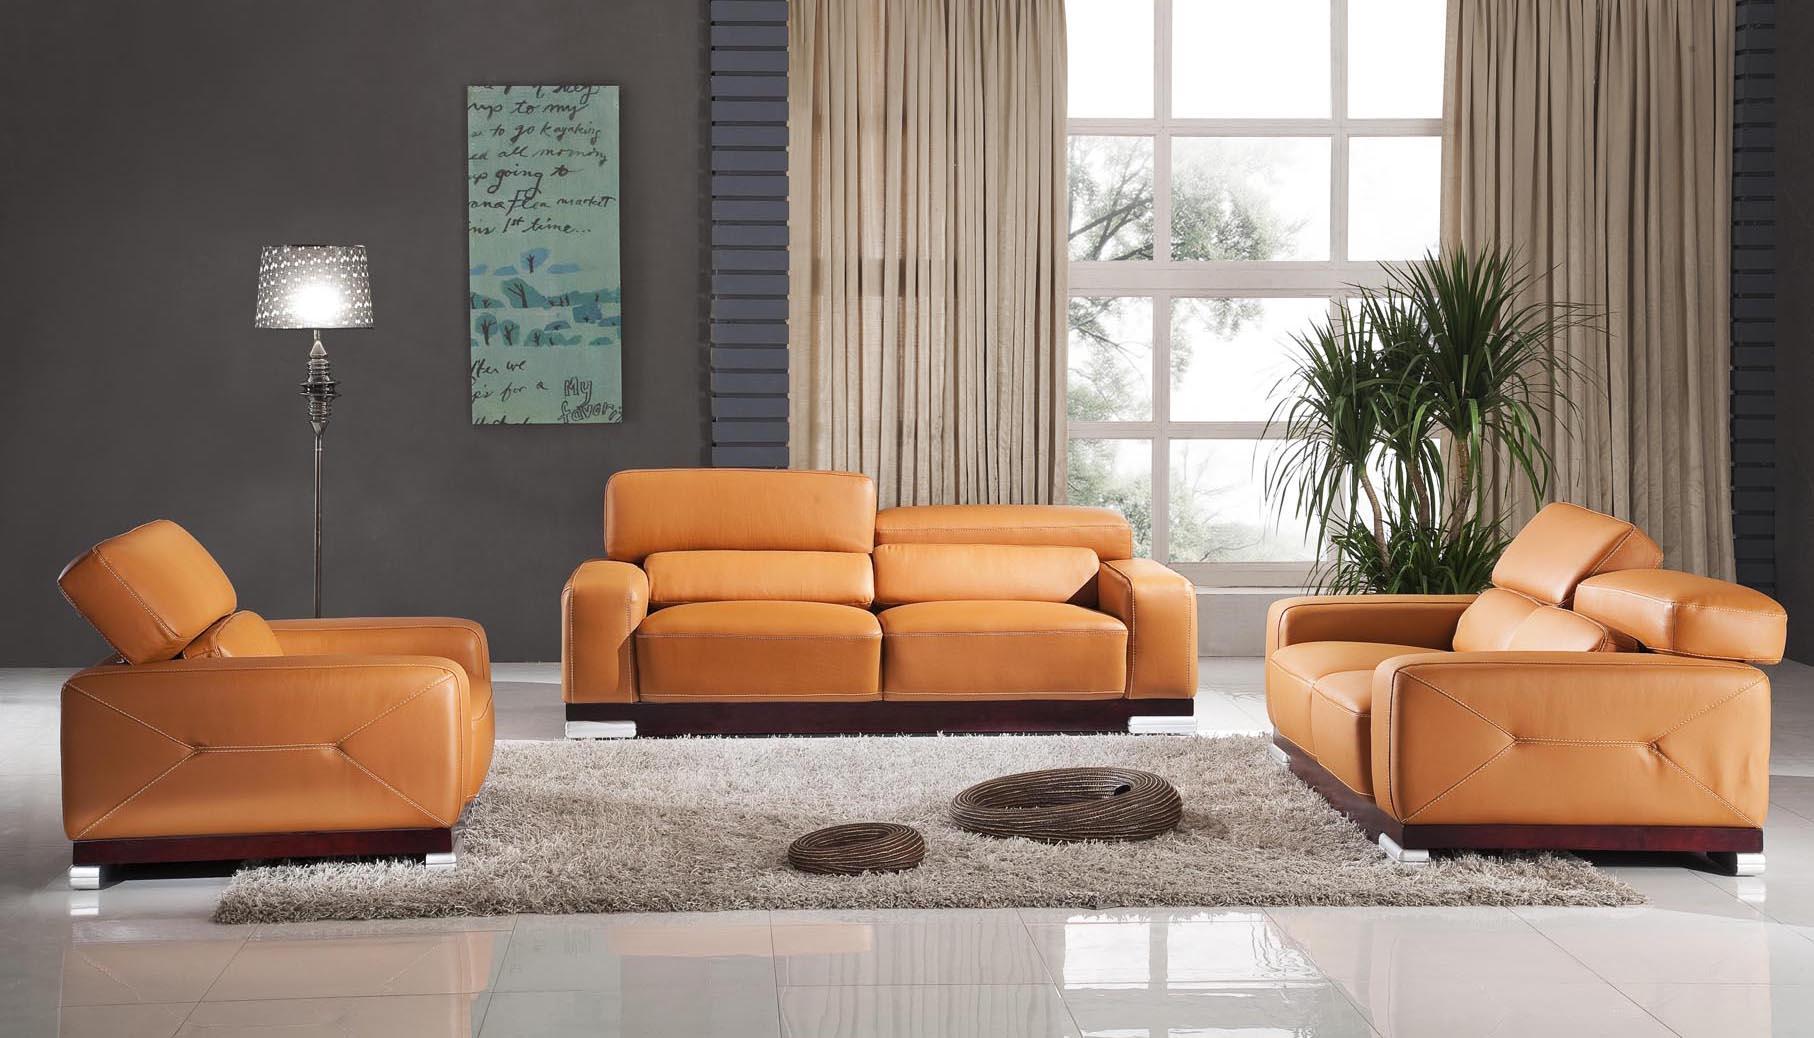 inexpensivelivingroomchairstReF  Design On Vine